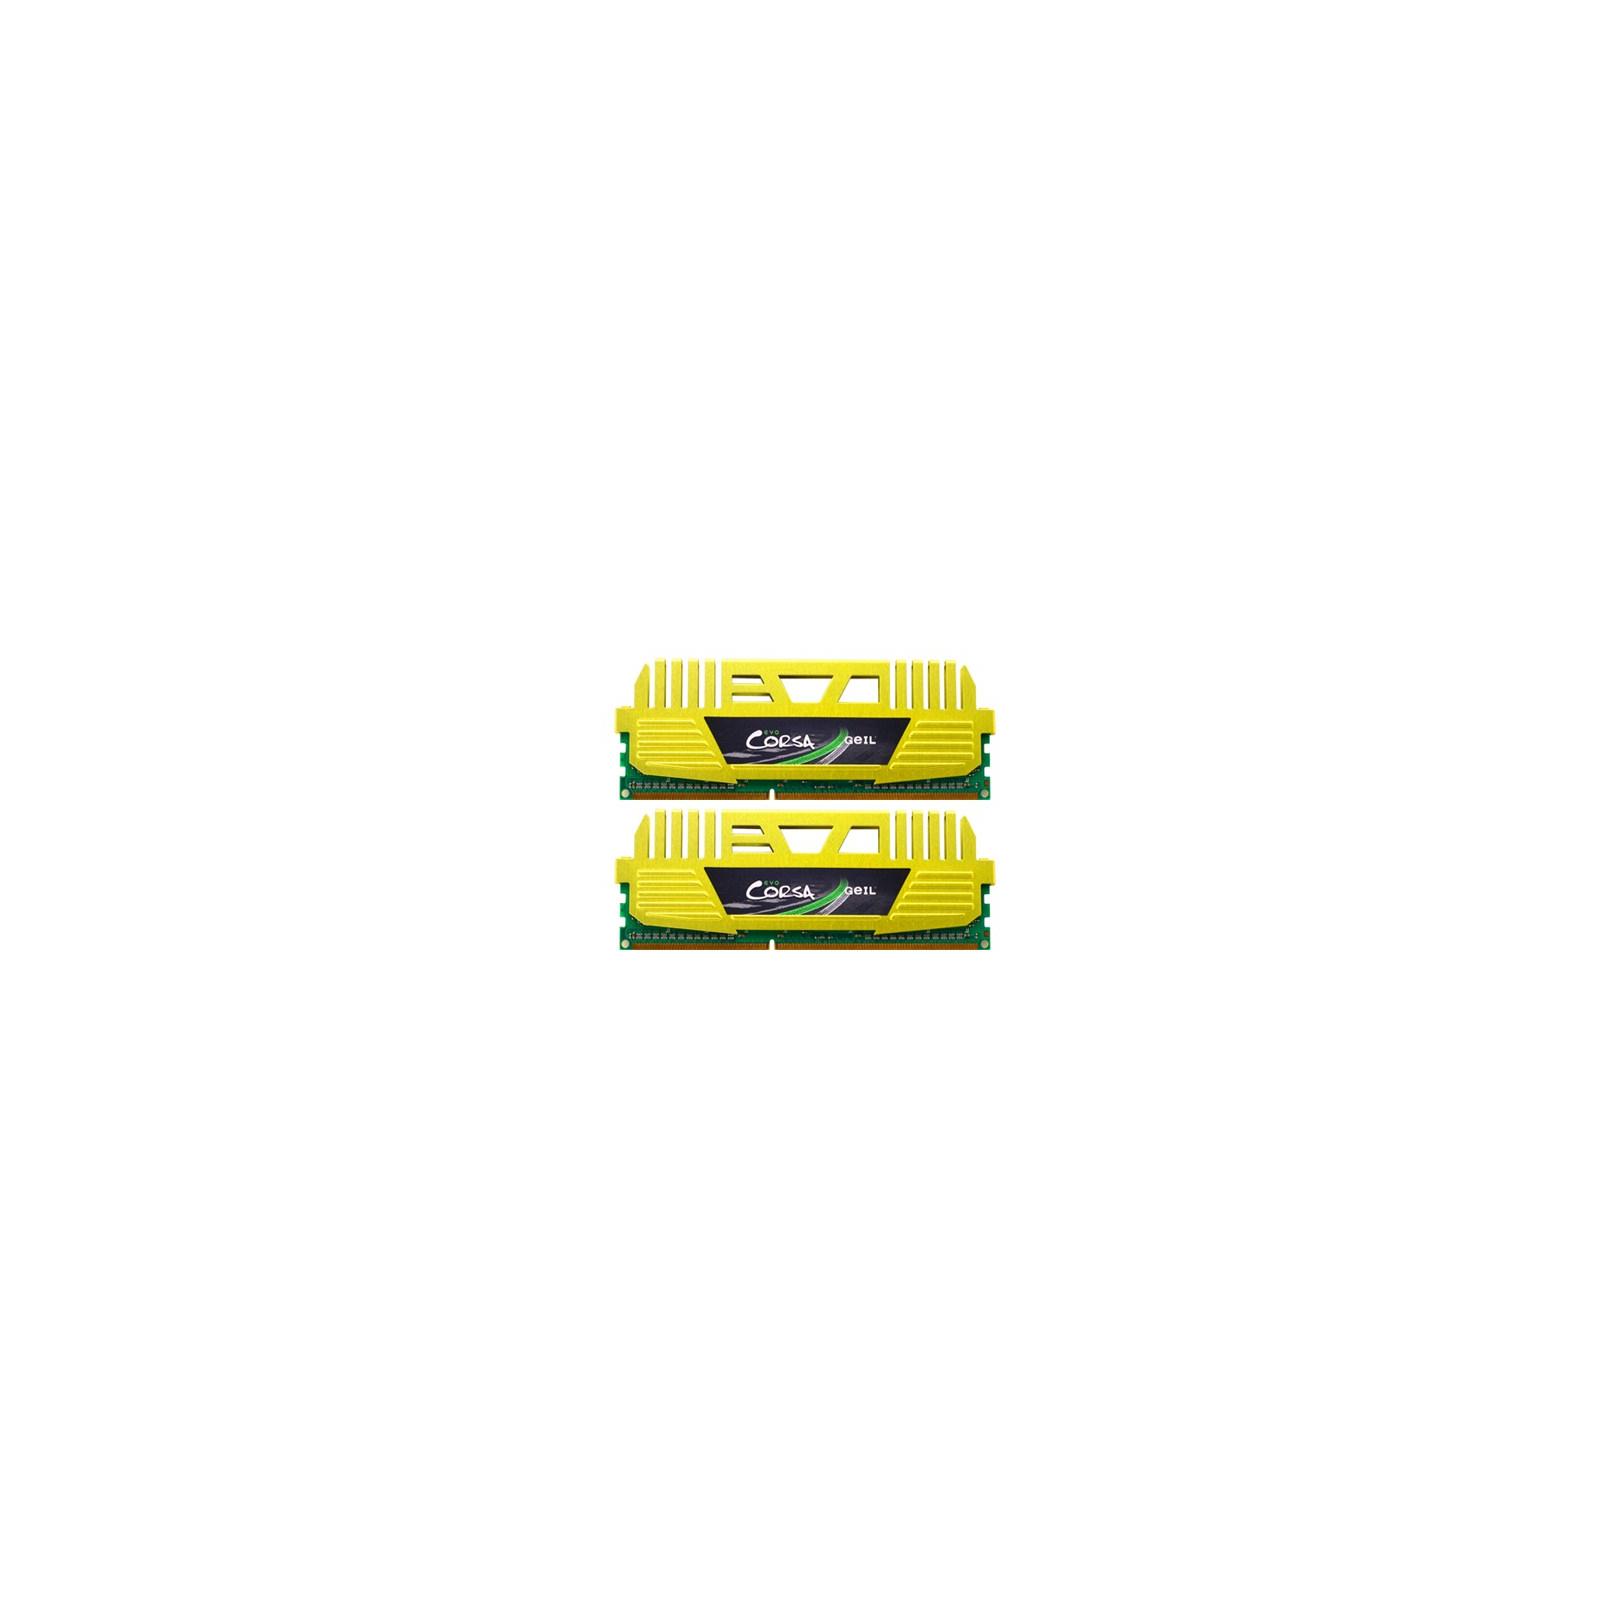 Модуль памяти для компьютера DDR3 8GB (2x4GB) 2400 MHz GEIL (GOC38GB2400C10DC)